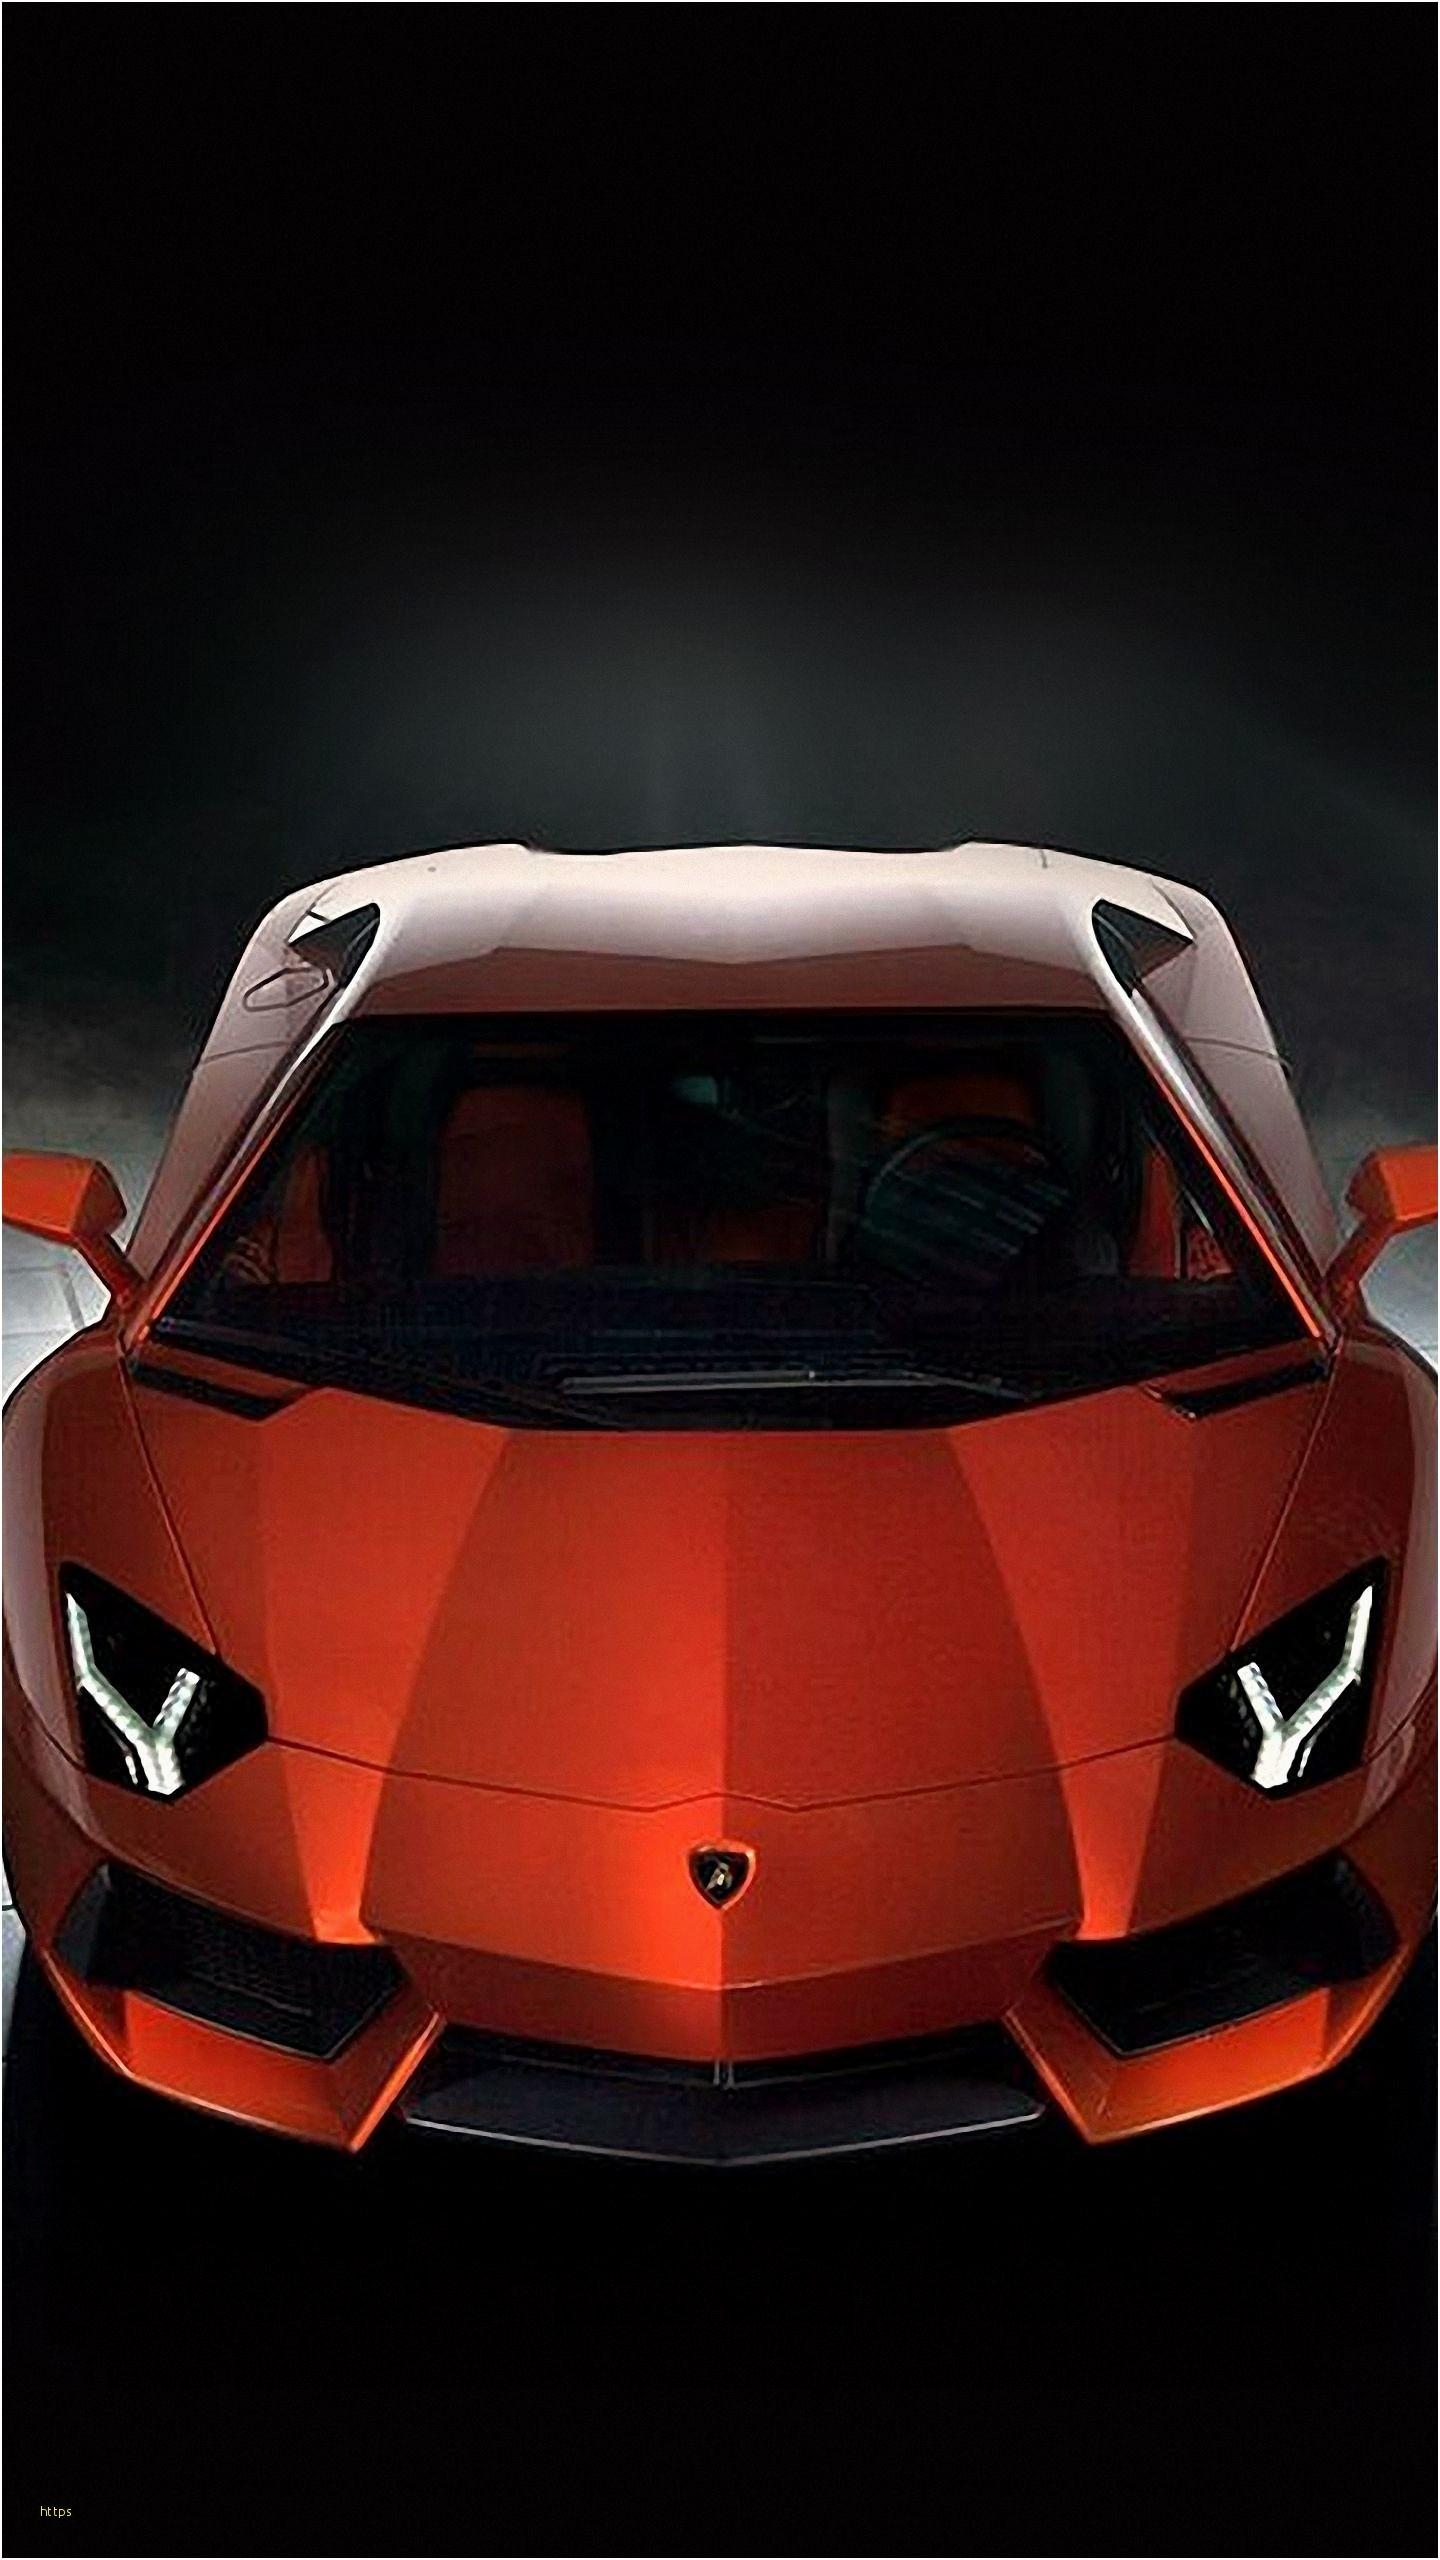 Lamborghini Logo Wallpaper Luxury Wallpaper Car For Ferrari Full Hd Car 1440x2560 Wallpaper Teahub Io